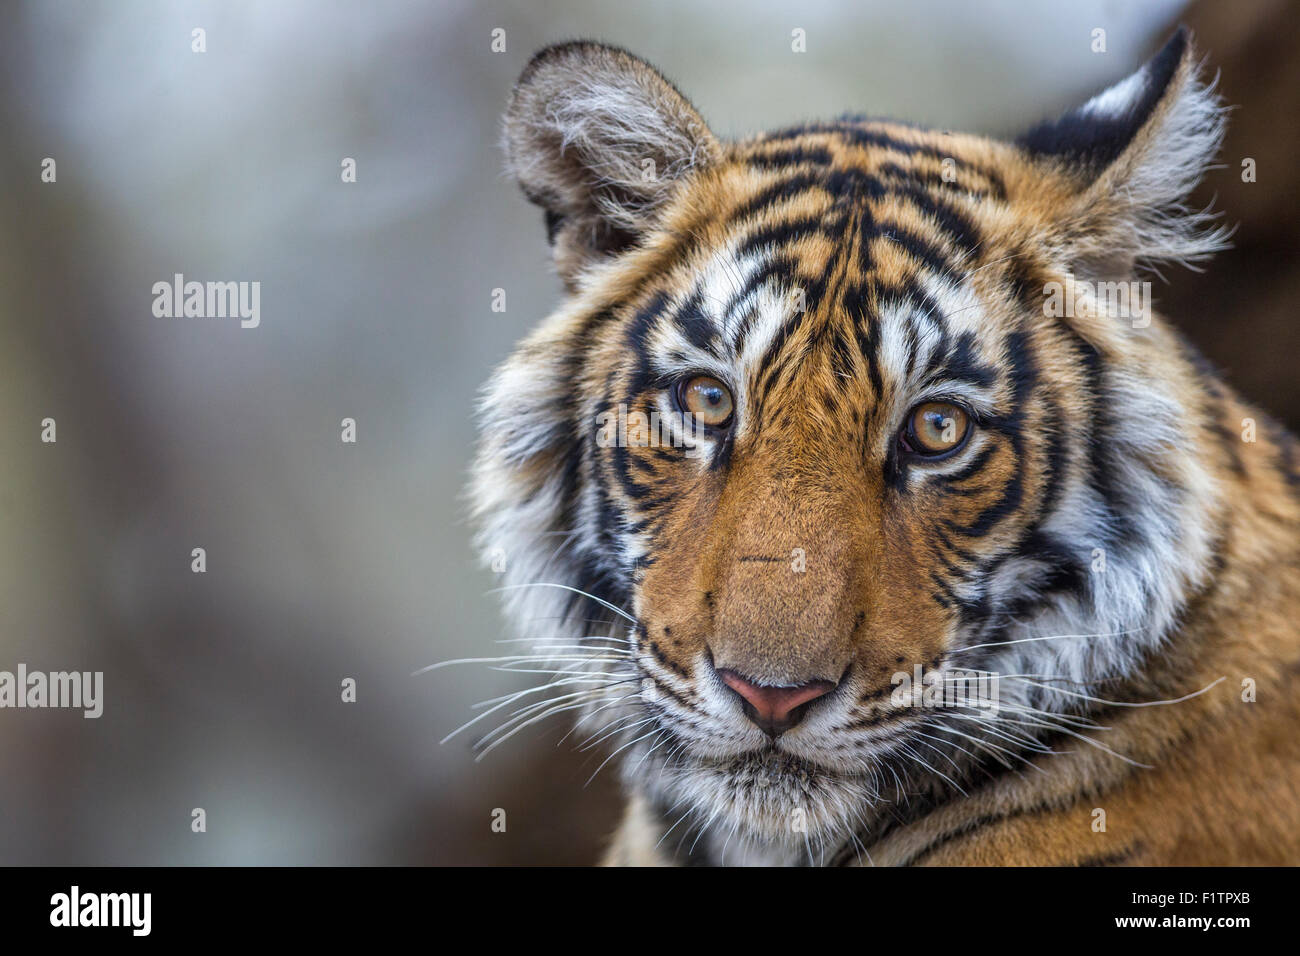 Los jóvenes salvajes bosques Ranthambhore Retrato Tigre de Bengala. [Panthera Tigris] Foto de stock